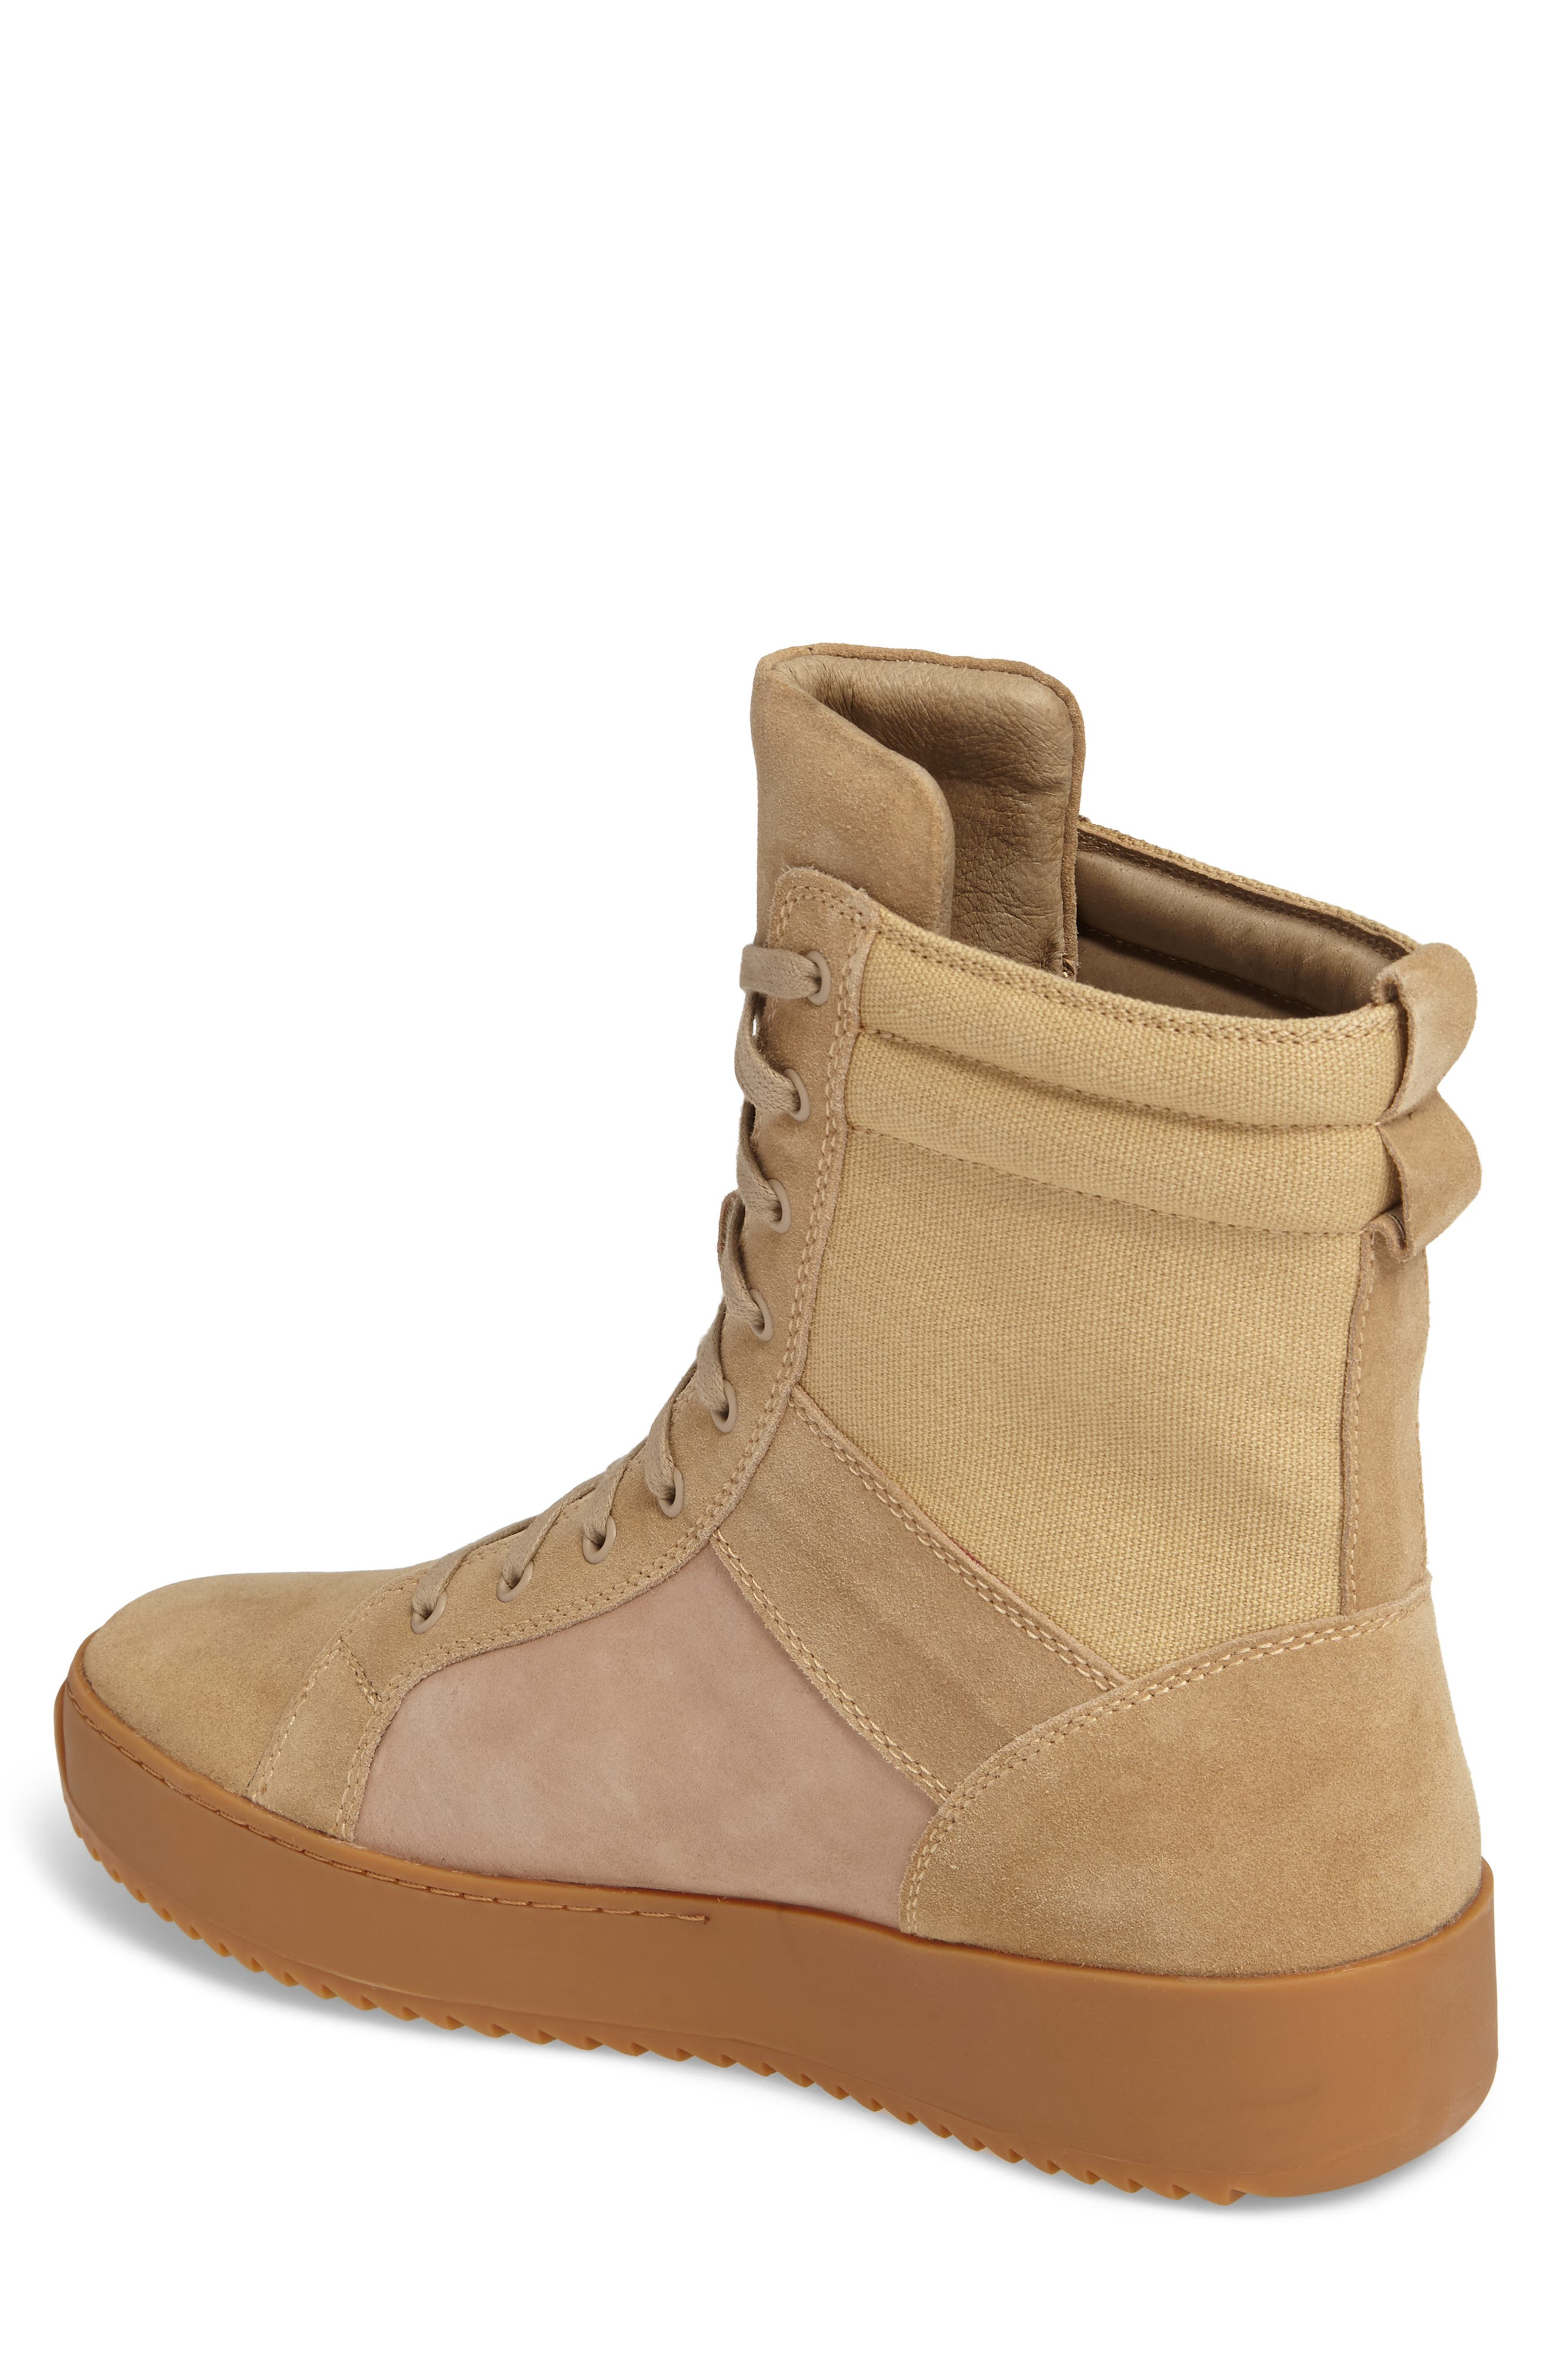 Shane Sneaker,                             Alternate thumbnail 2, color,                             SAND SUEDE